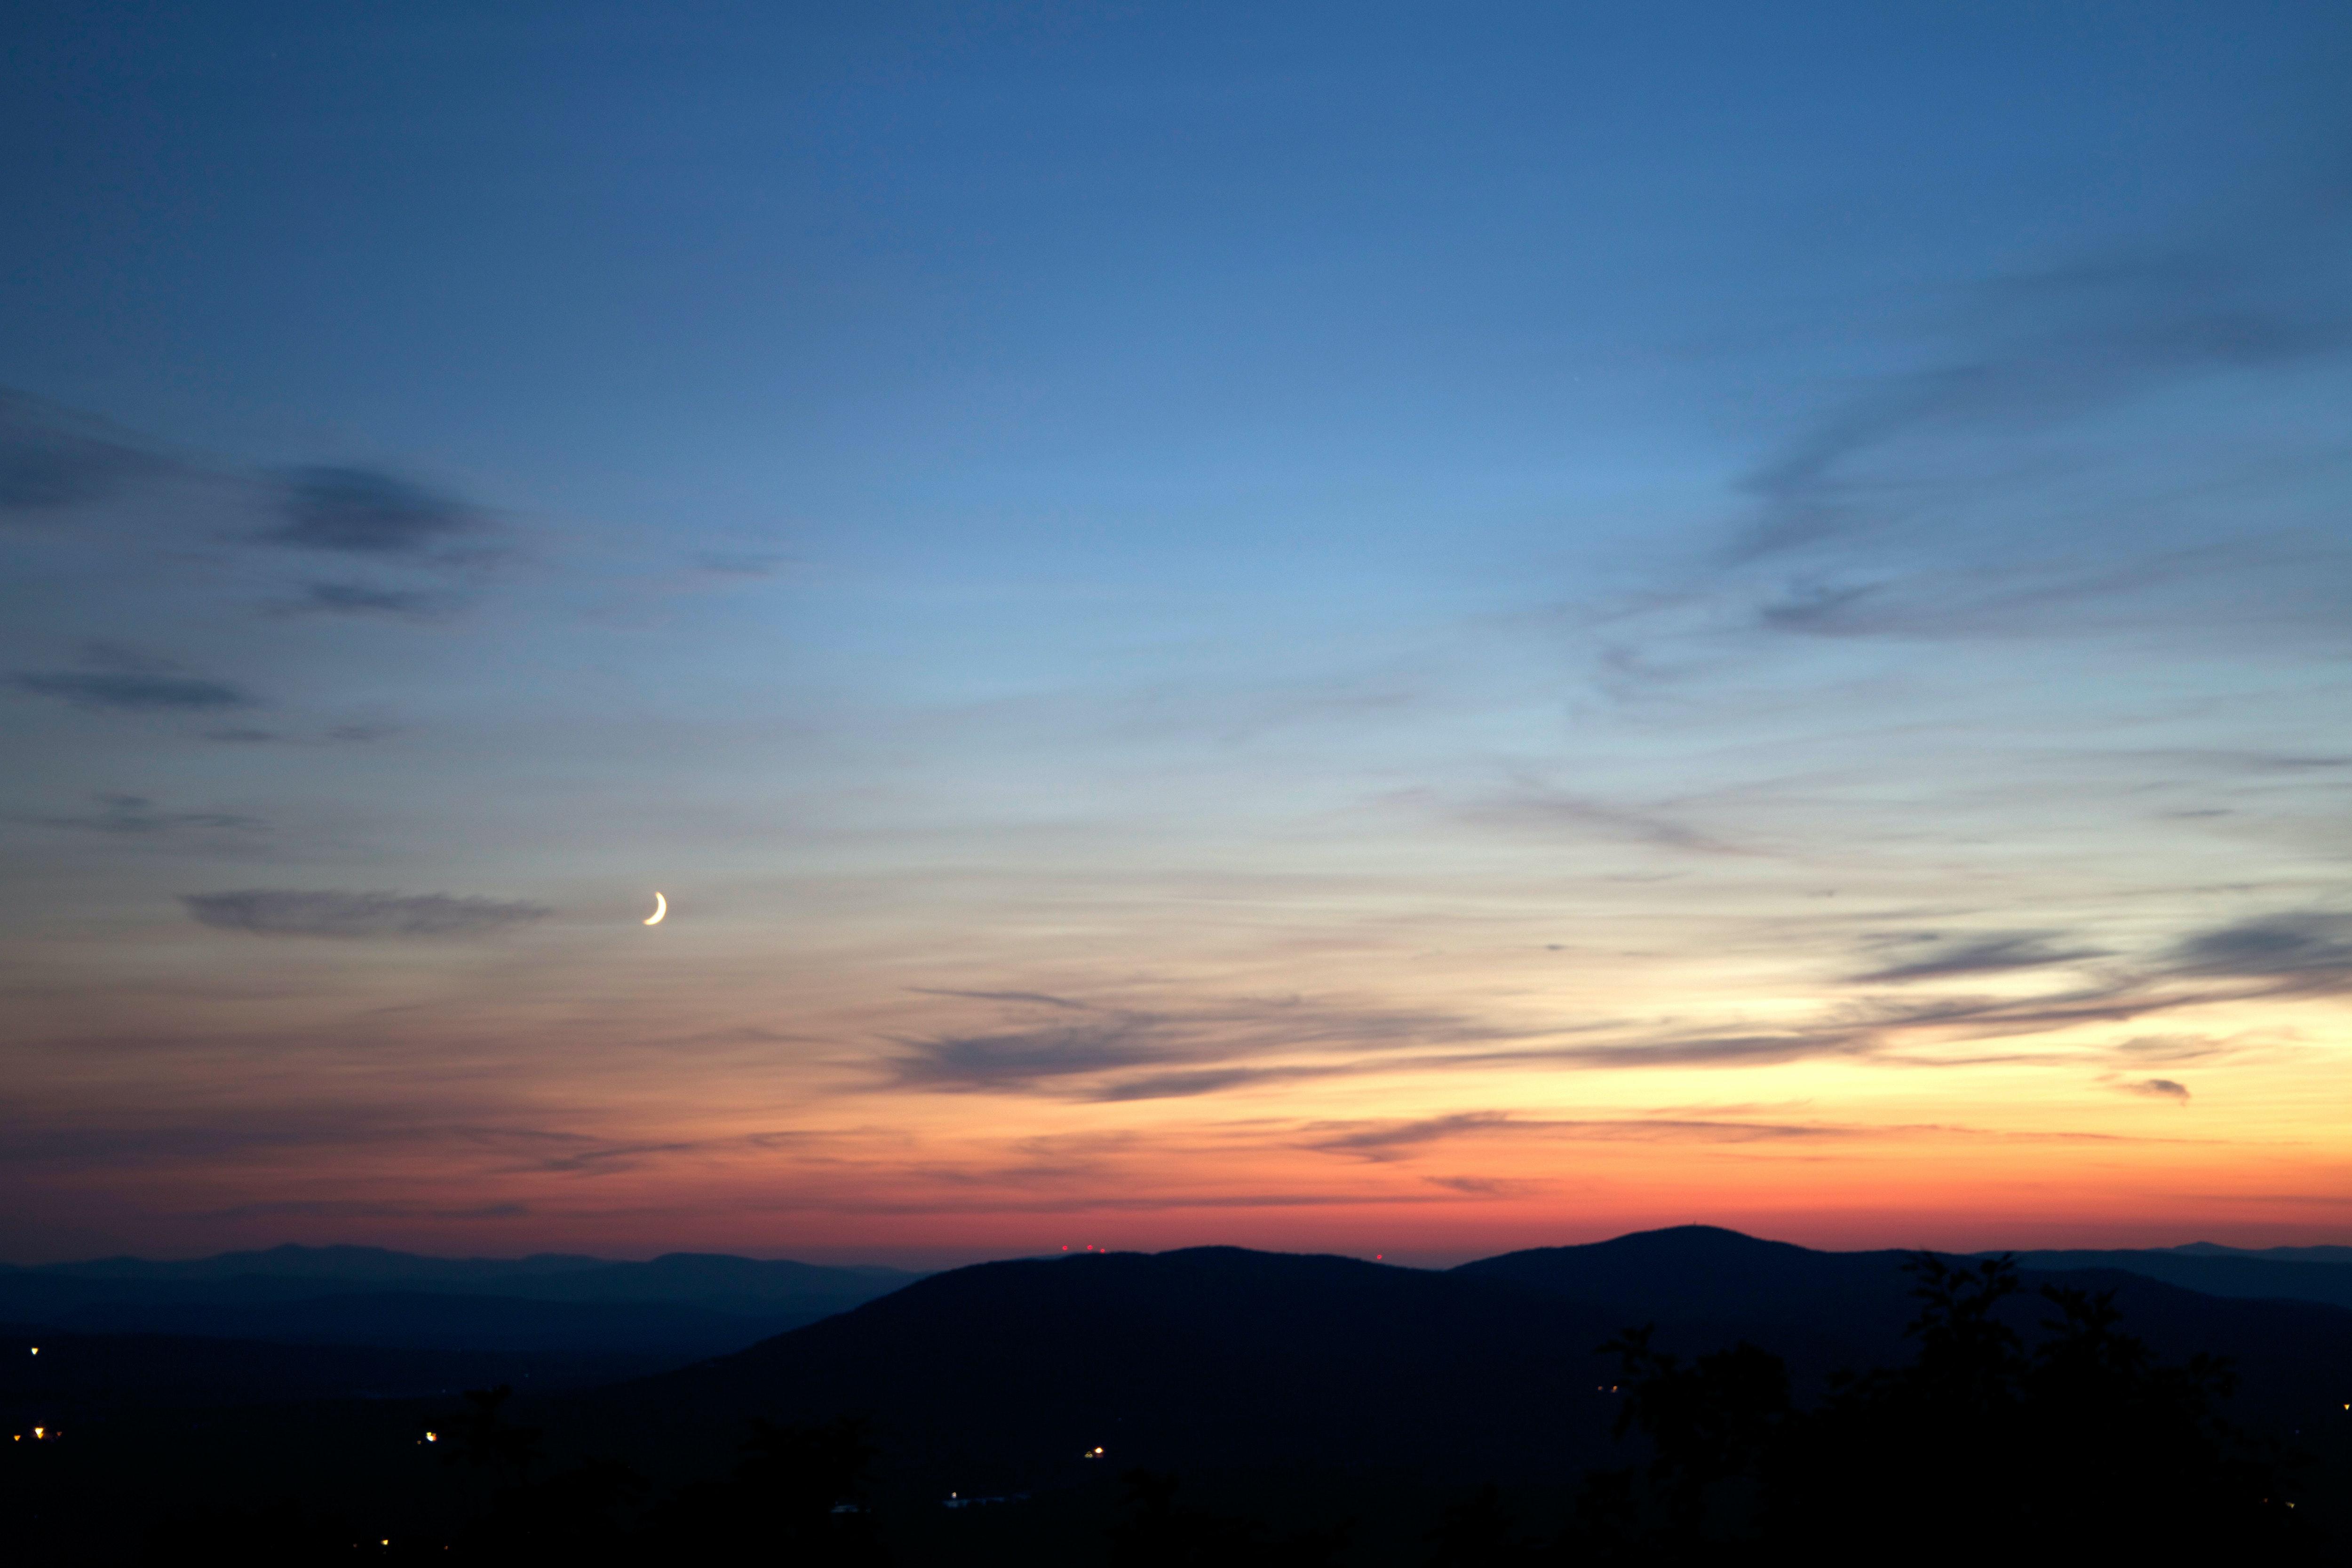 Image of sunset sky